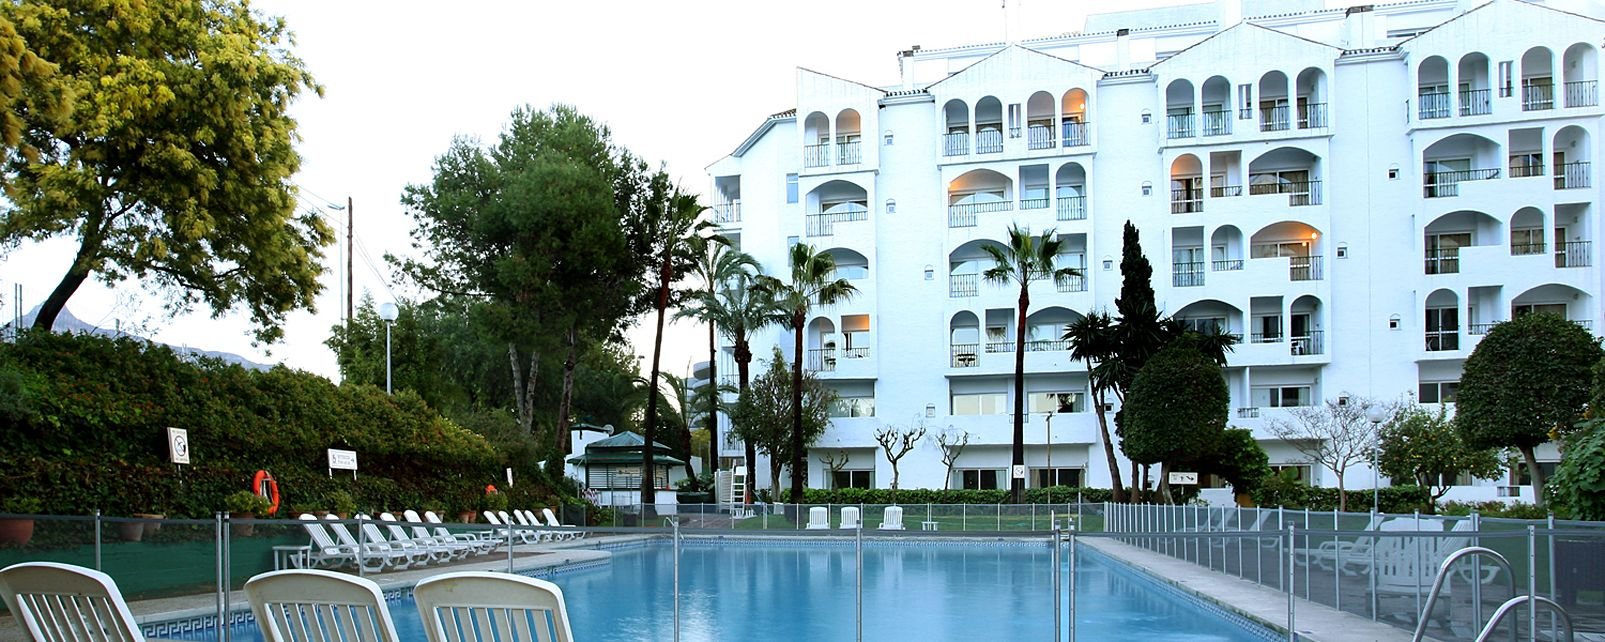 Hôtel Pyr Marbella